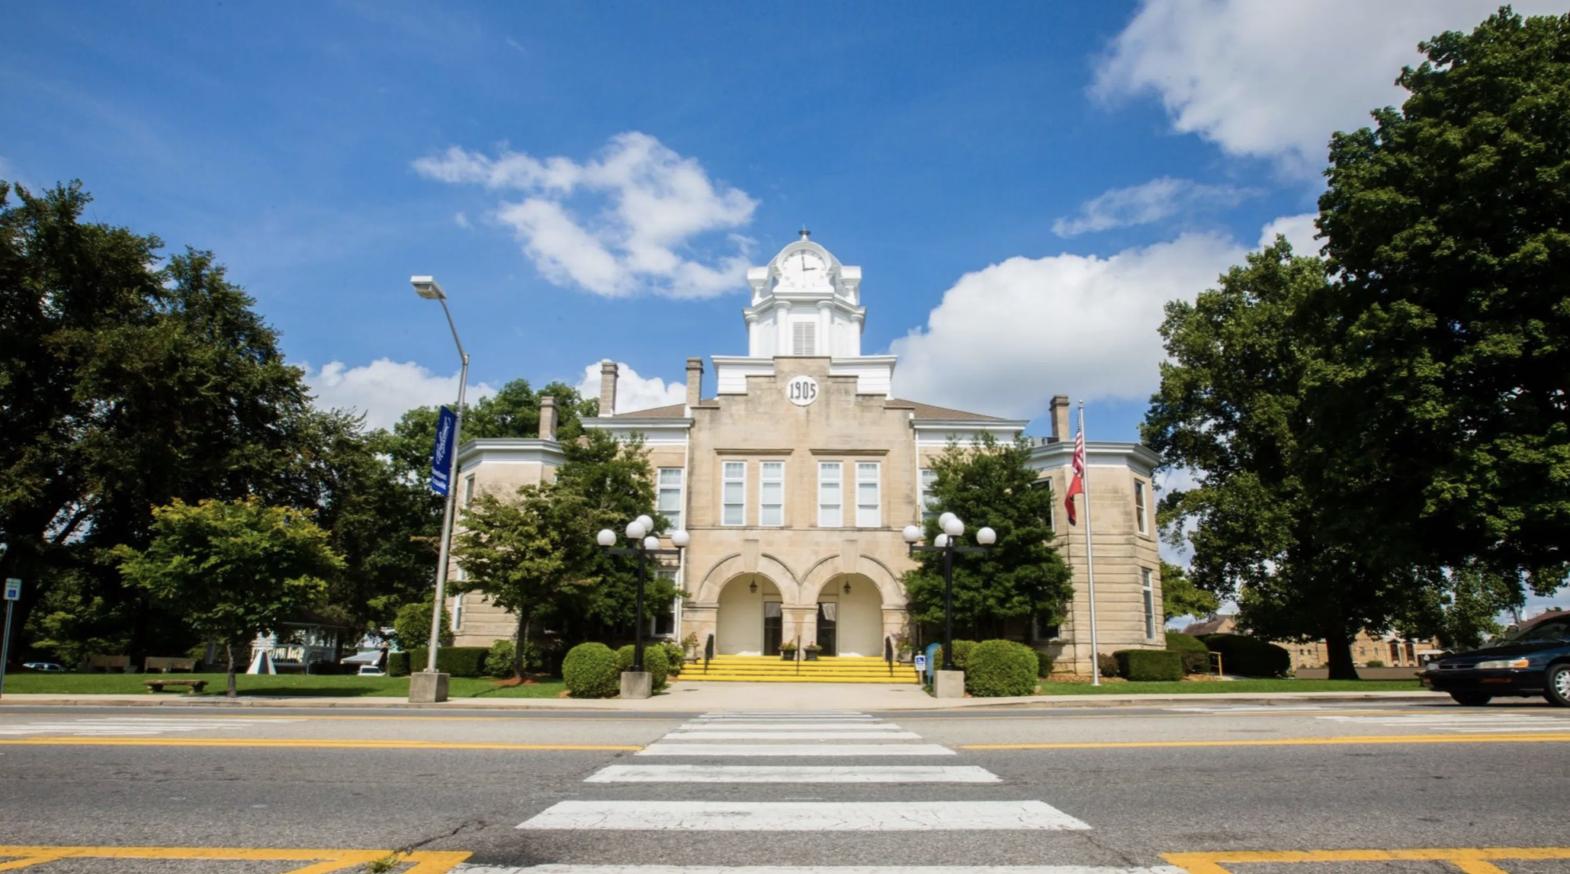 Cumberland County Courthouse (Photo: cumberlandcountytn.gov)